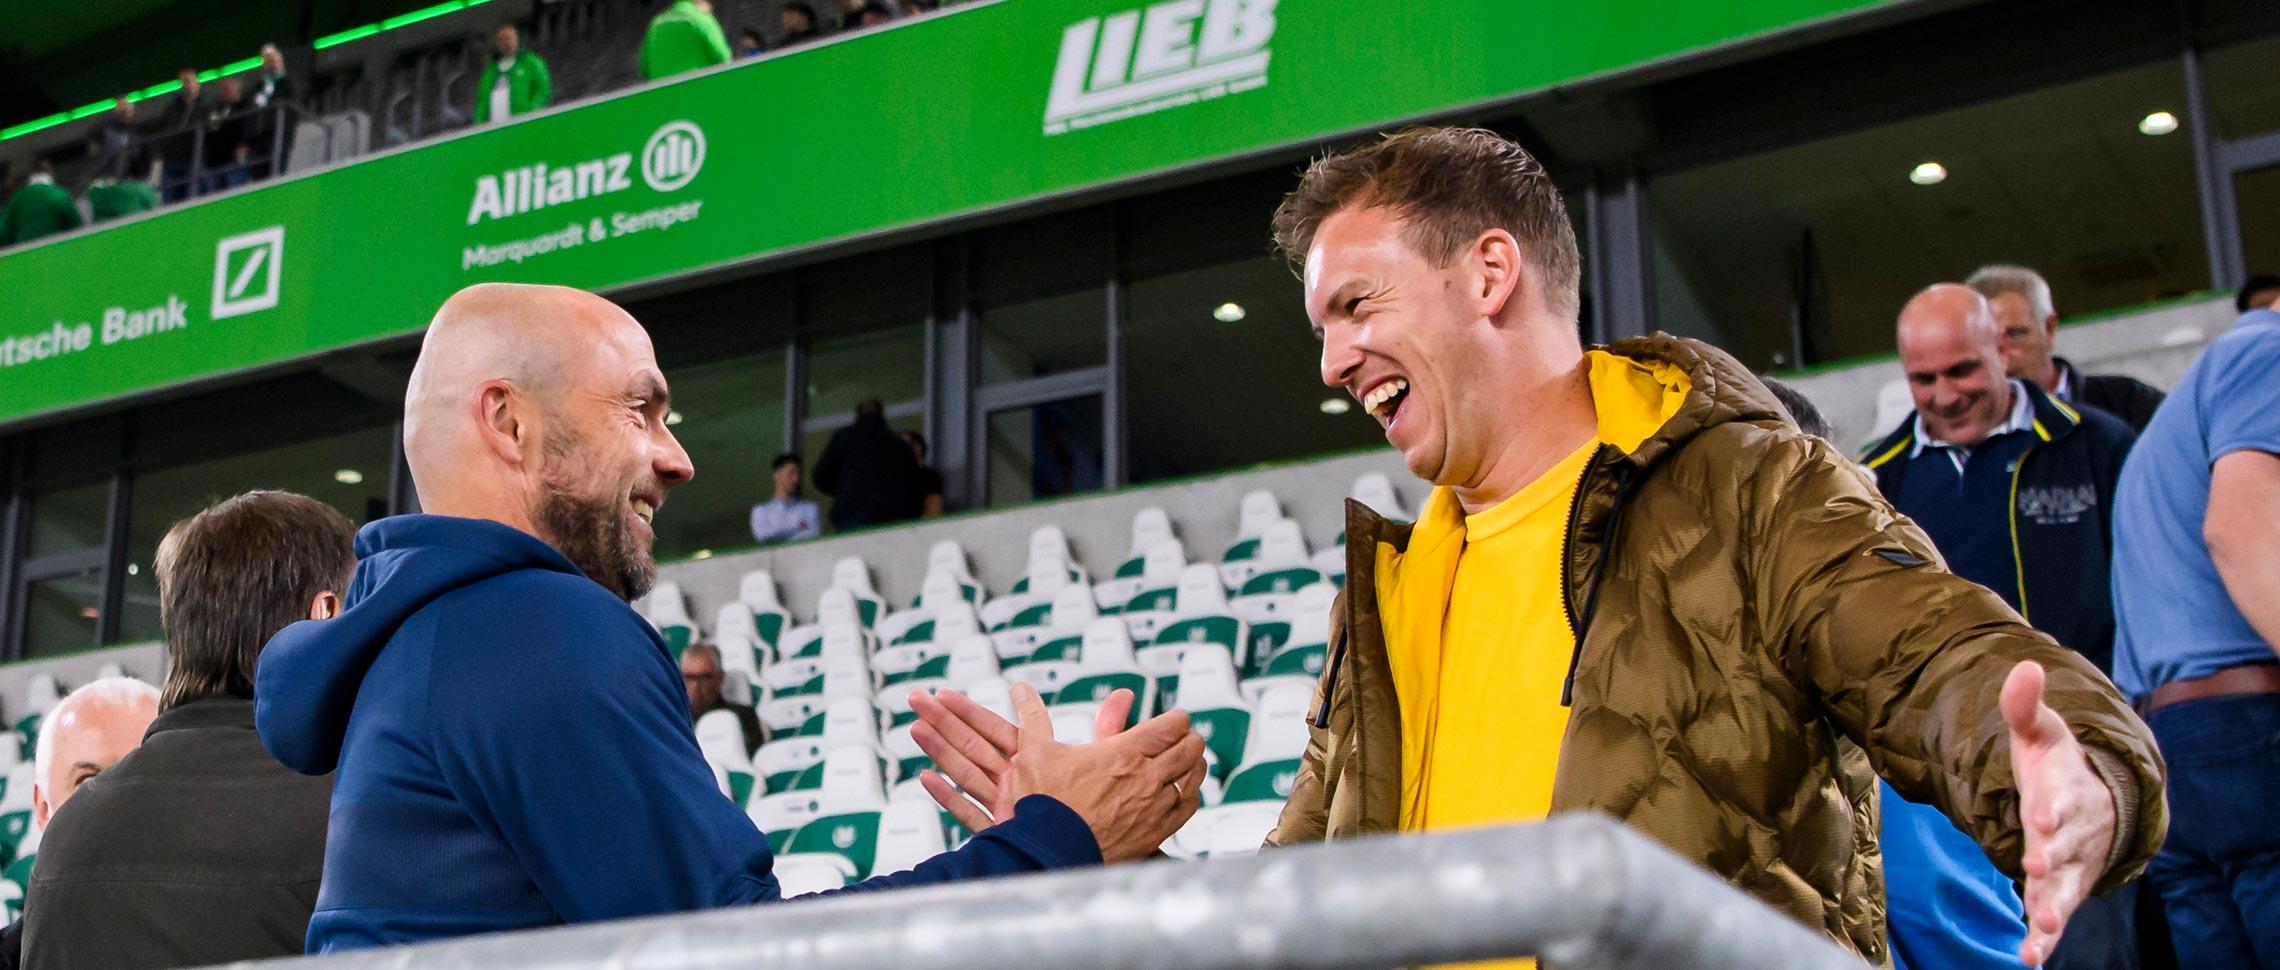 RBLTSG: First time facing Nagelsmann » TSG Hoffenheim